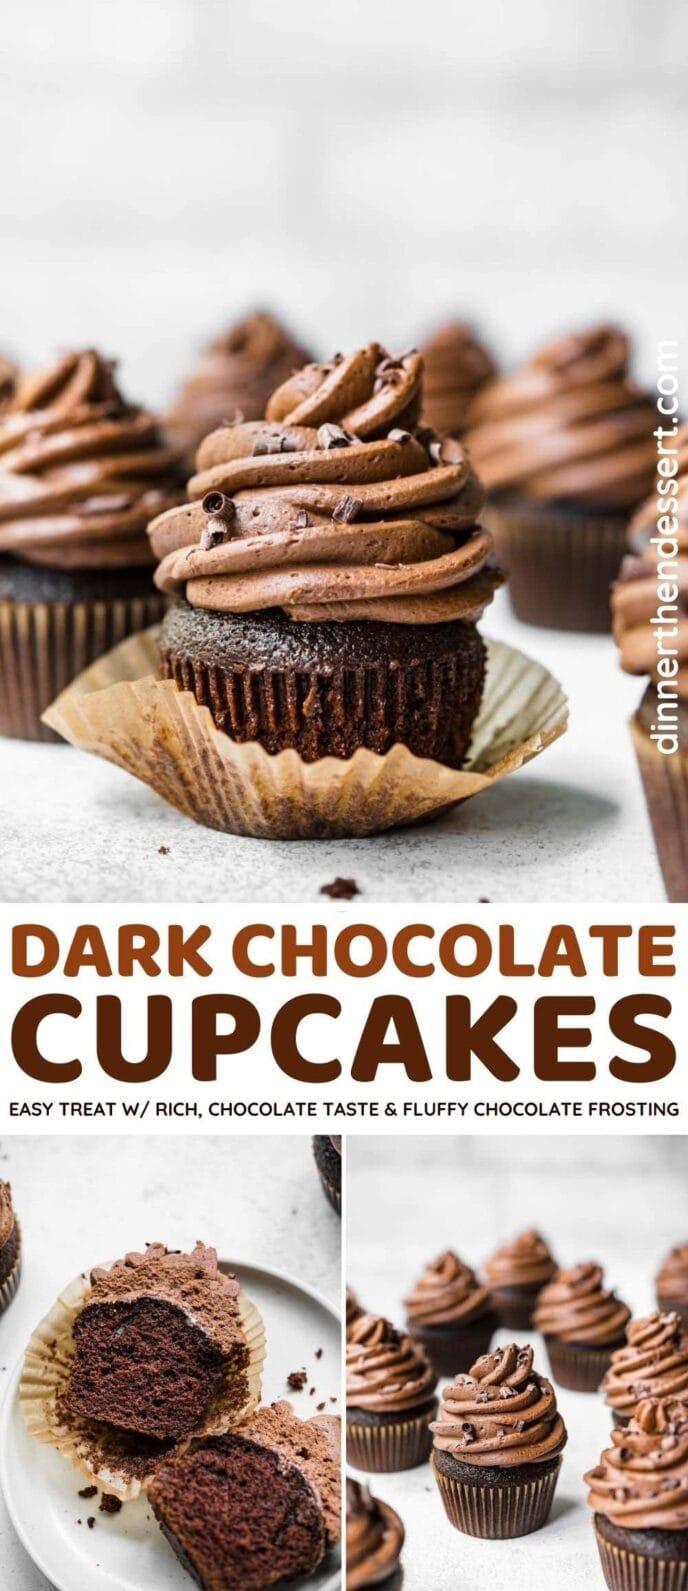 Dark Chocolate Cupcakes collage